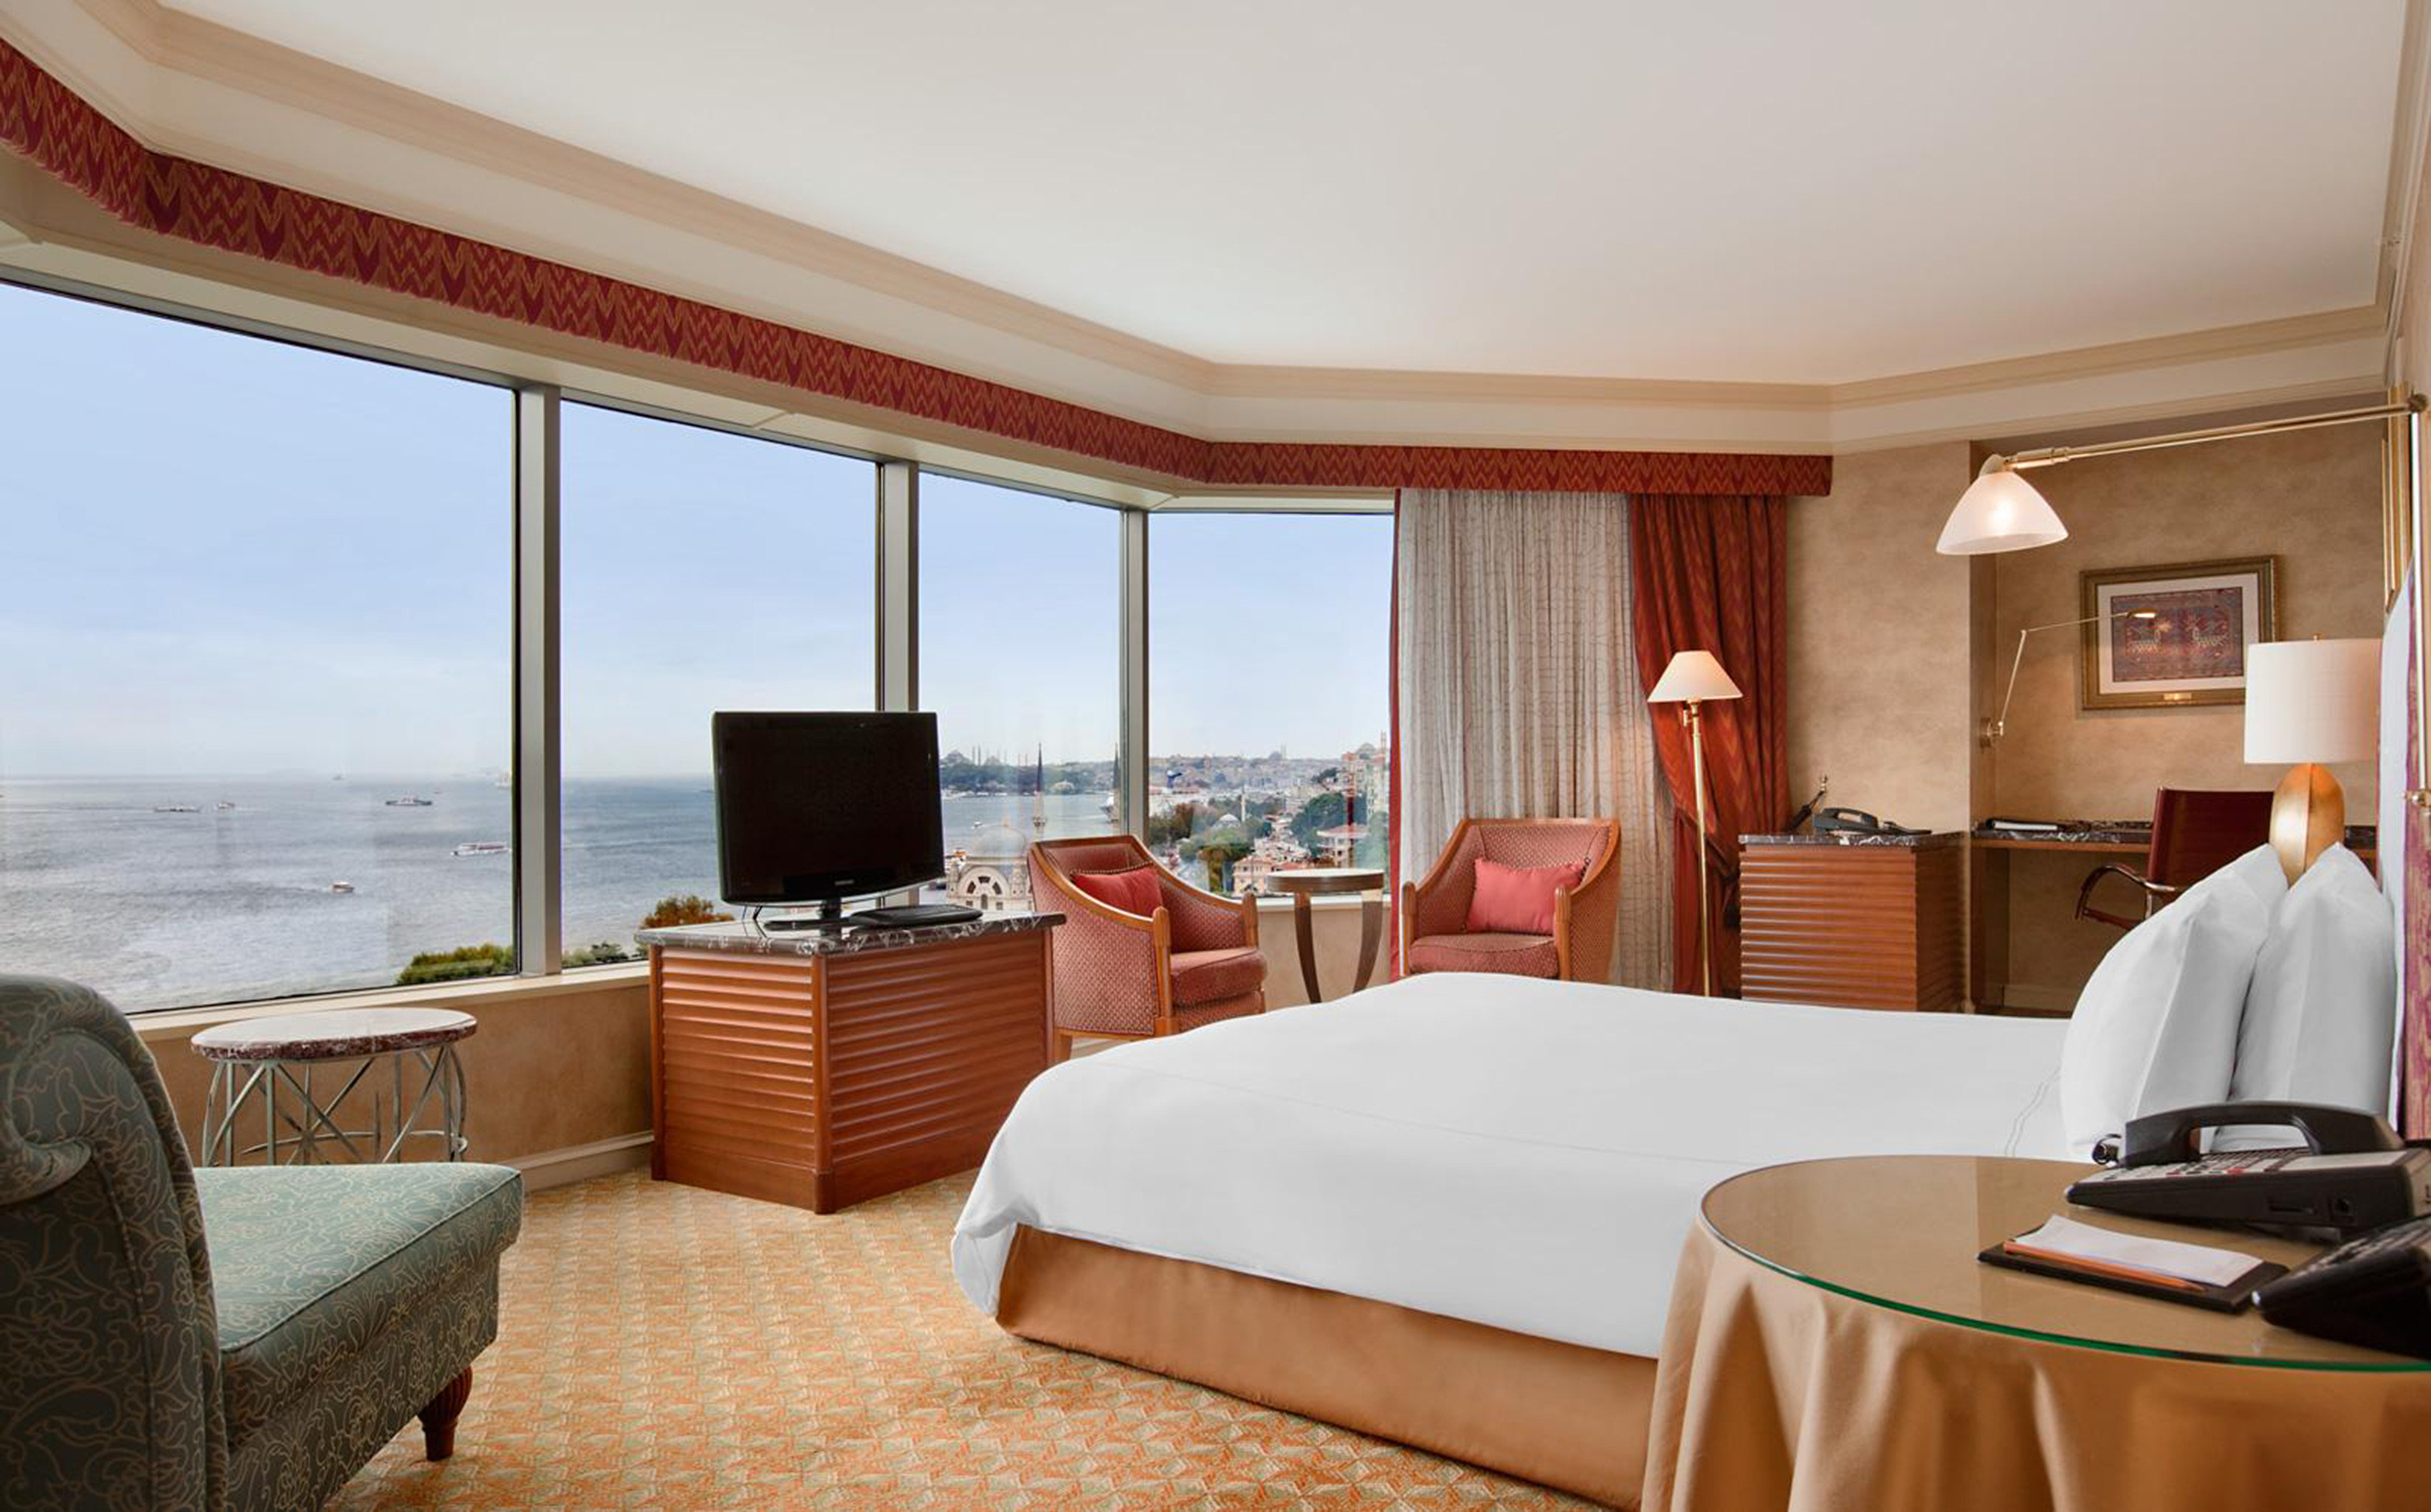 Bedroom Elegant Hip Luxury Modern Scenic views Suite chair property Resort home Villa living room cottage